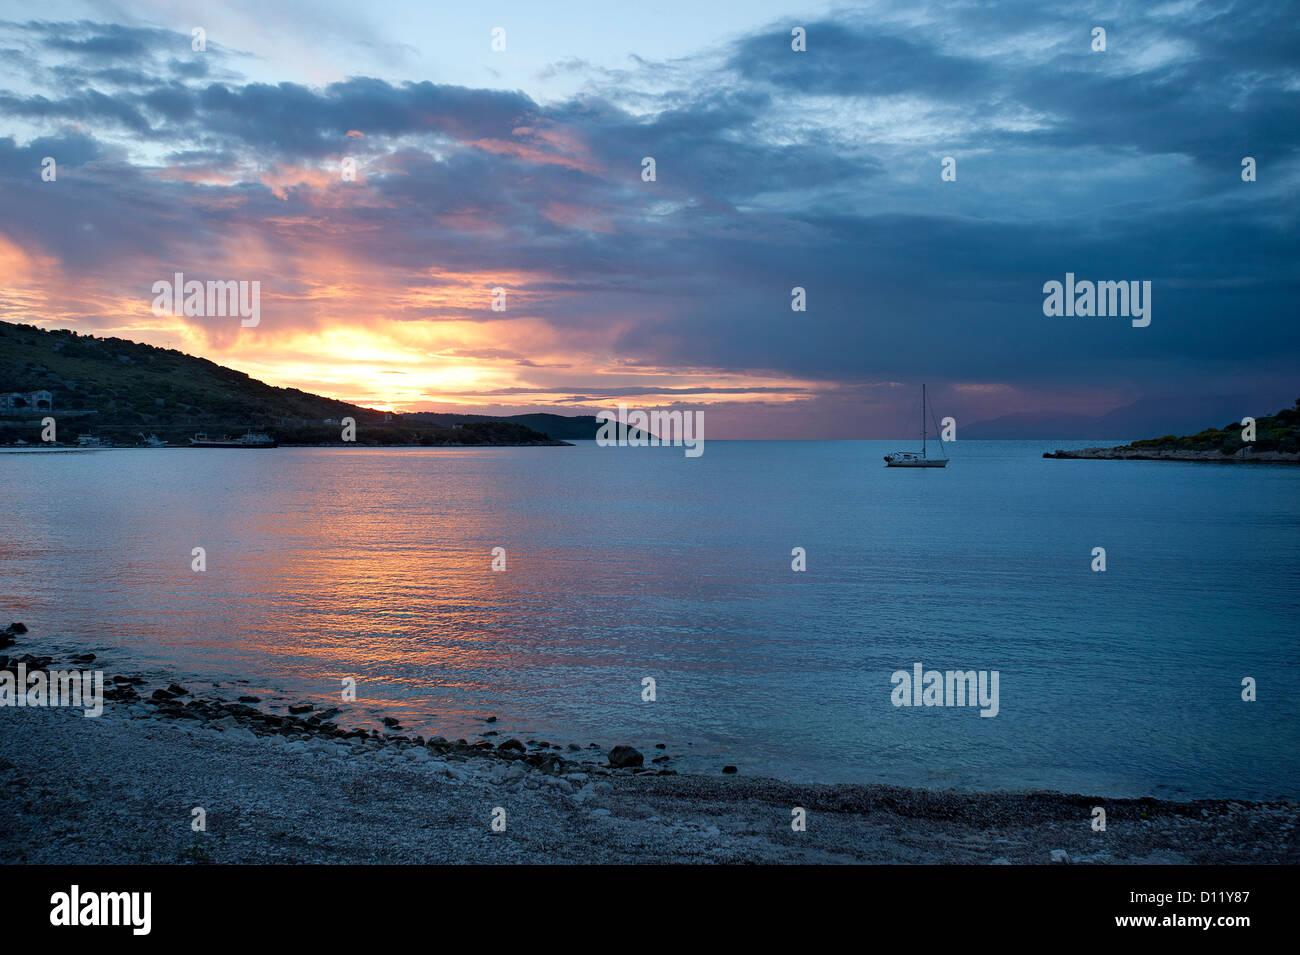 Sunset at Kassiopi Beach, Corfu, Ionian Islands, Greece Stock Photo